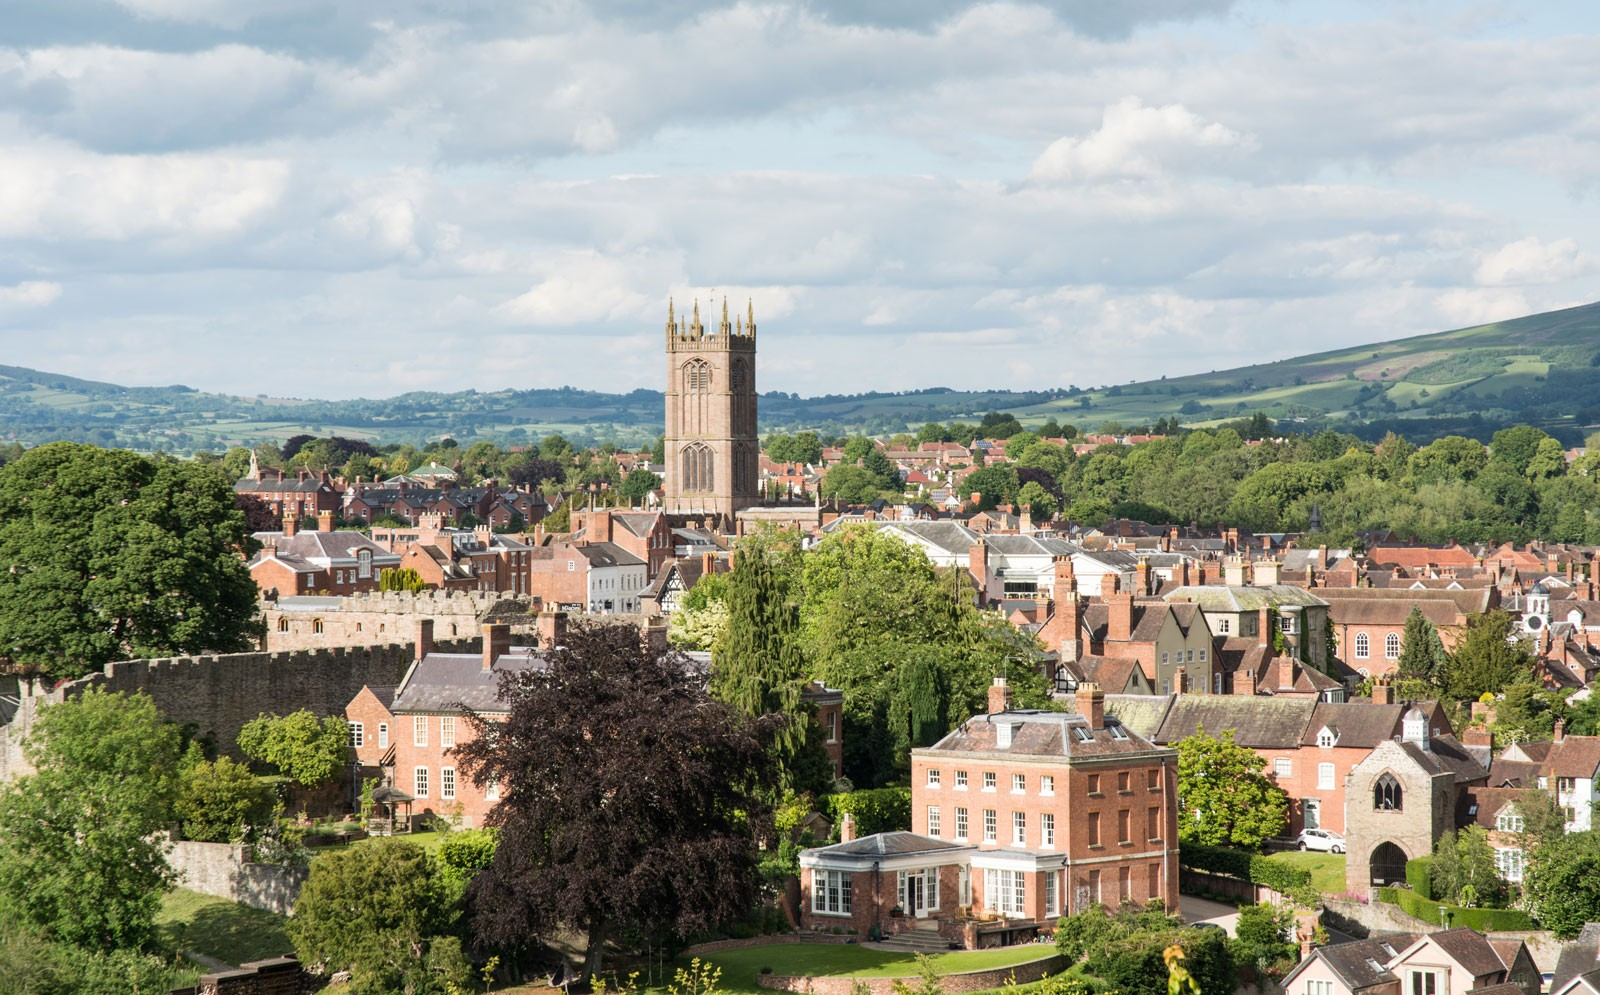 Ludlow-Shropshire-d076338